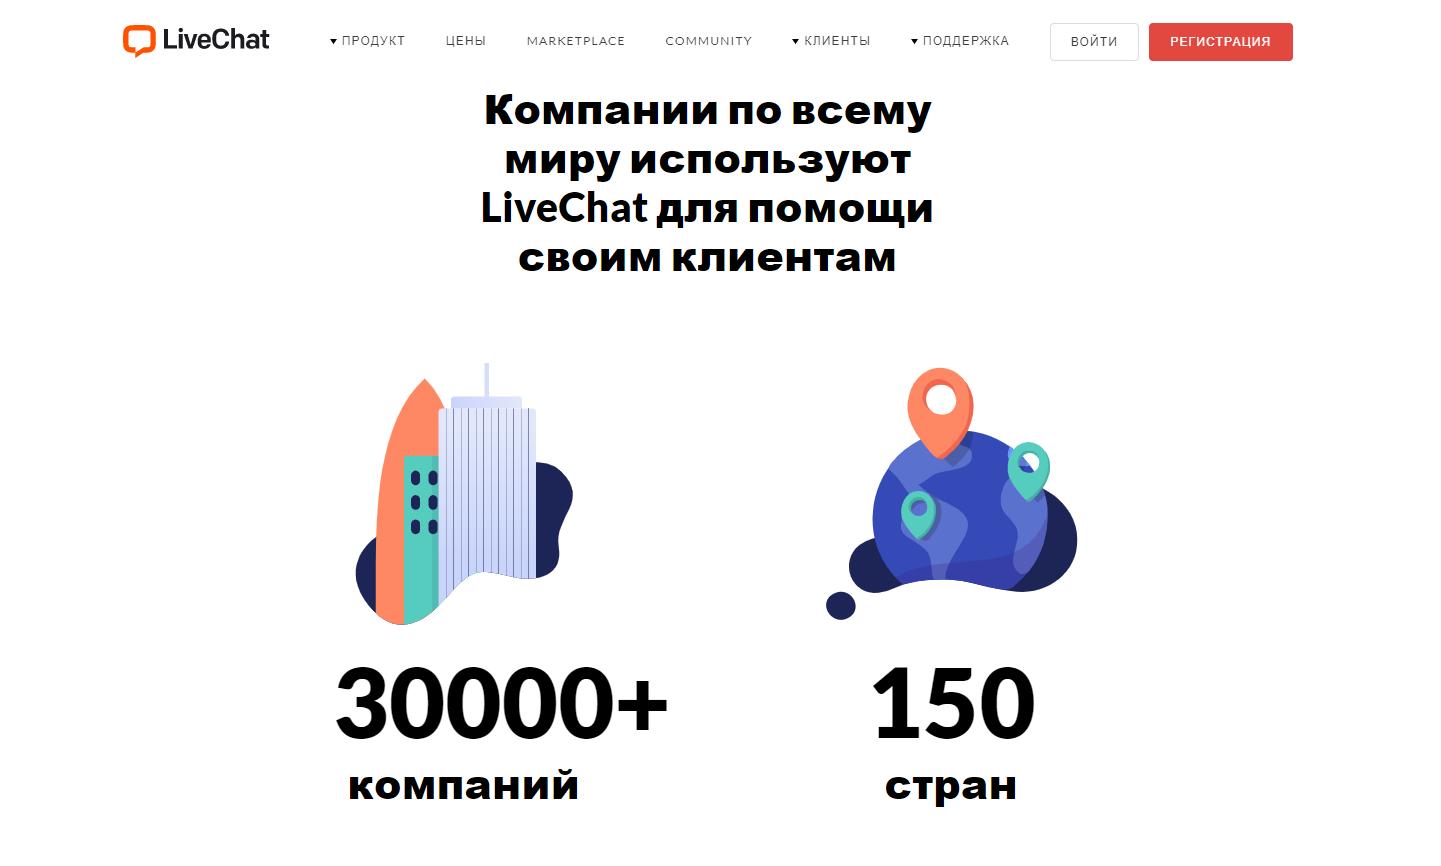 LiveChat главная страница